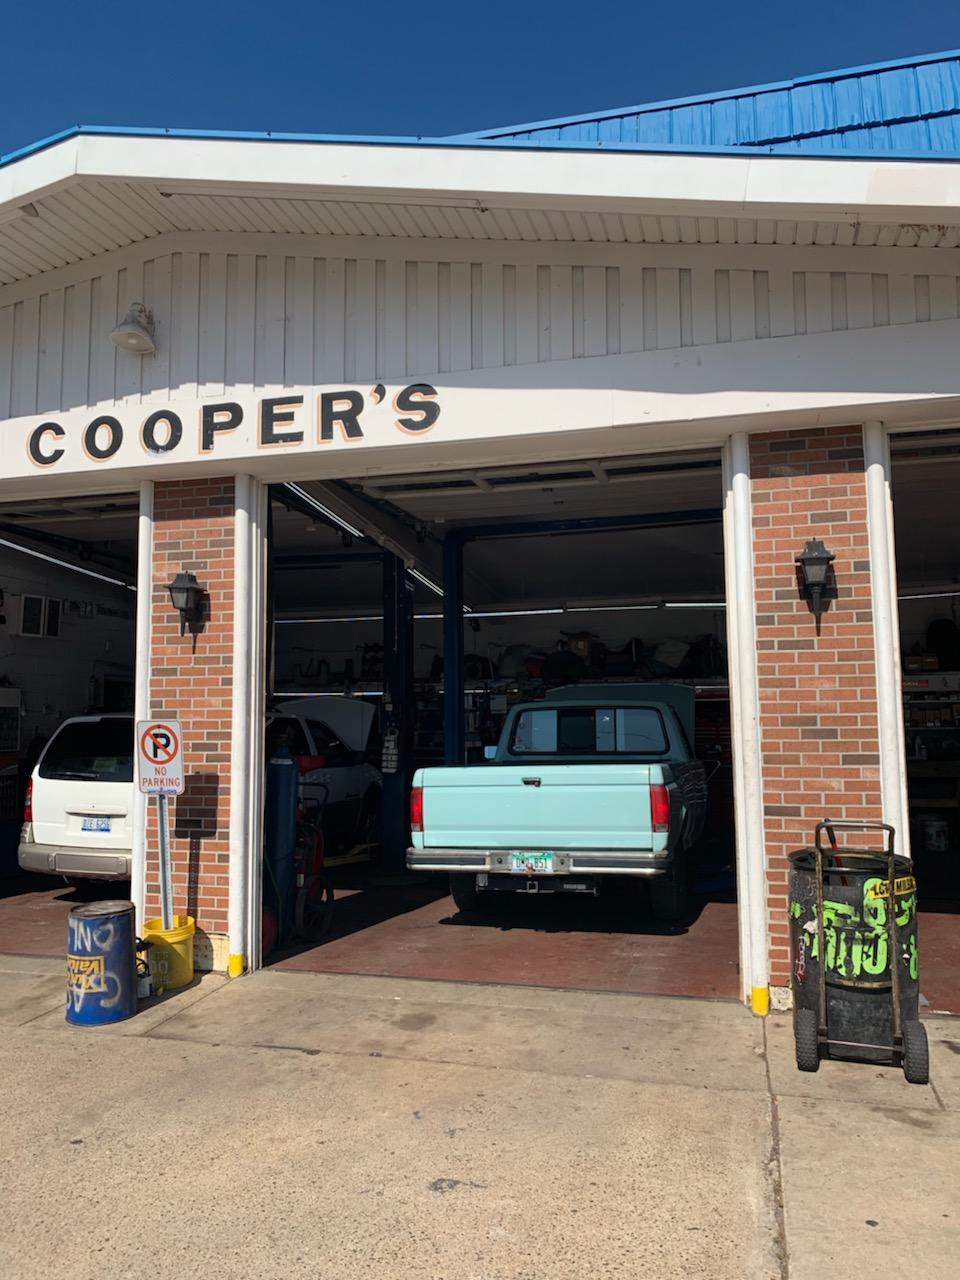 Coopers Garage - car repair    Photo 7 of 10   Address: 21244 Van Born Rd, Dearborn Heights, MI 48125, USA   Phone: (313) 278-0408